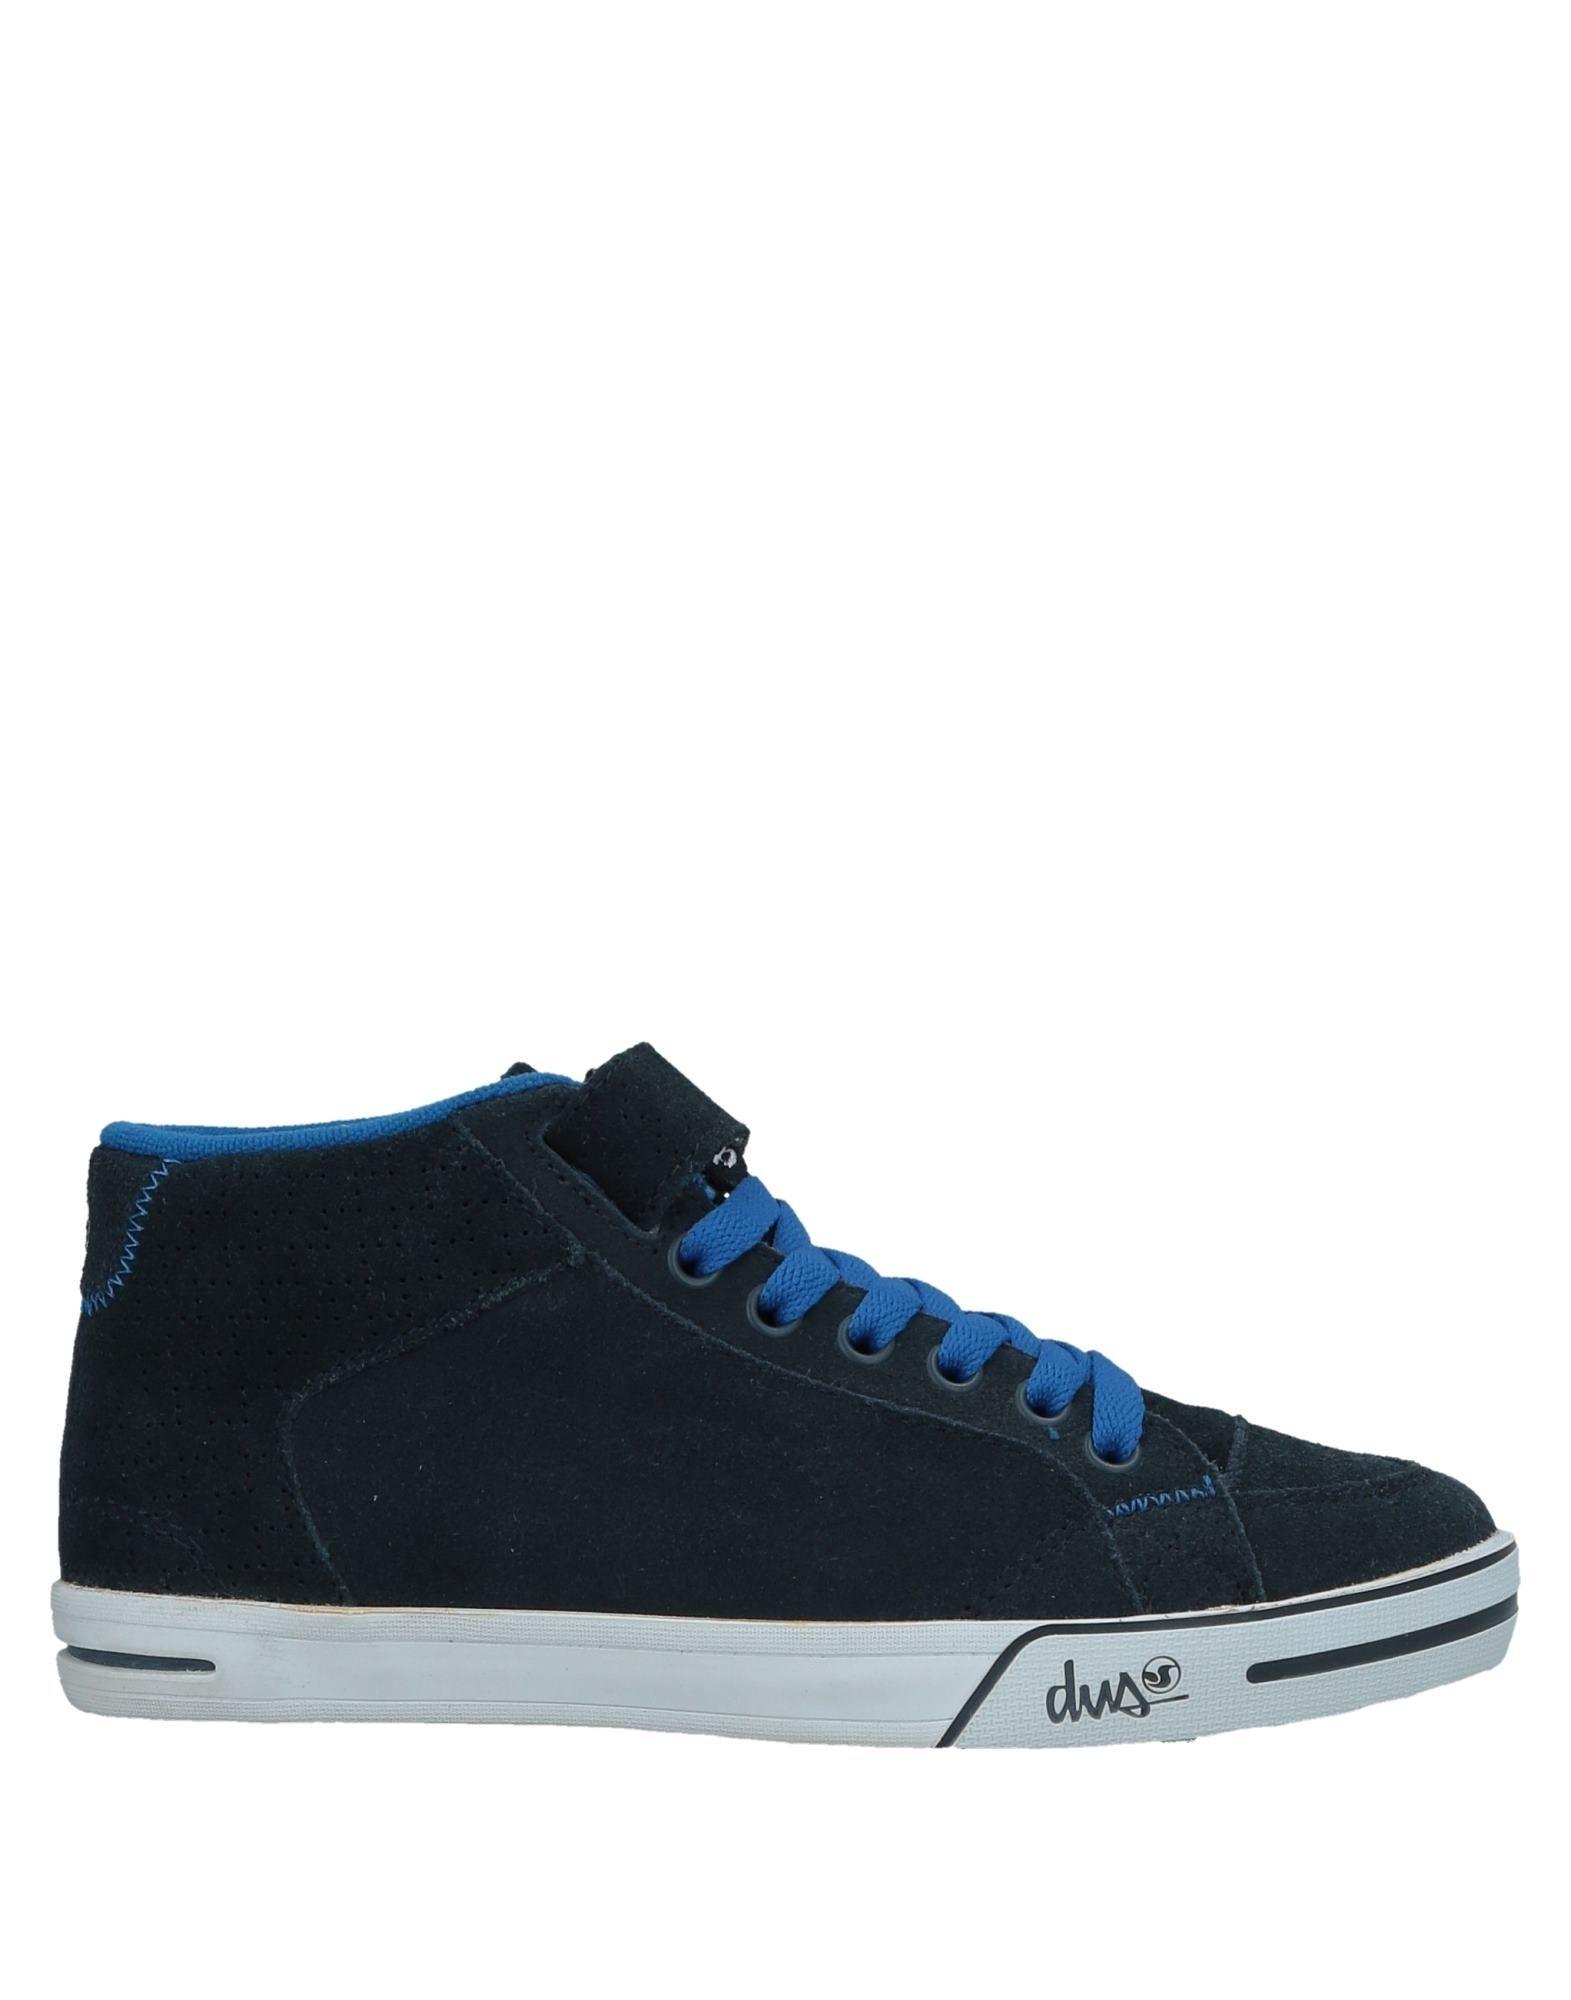 Scarpe Company da Ginnastica Dvs Shoe Company Scarpe Donna - 11532537TP 424f11